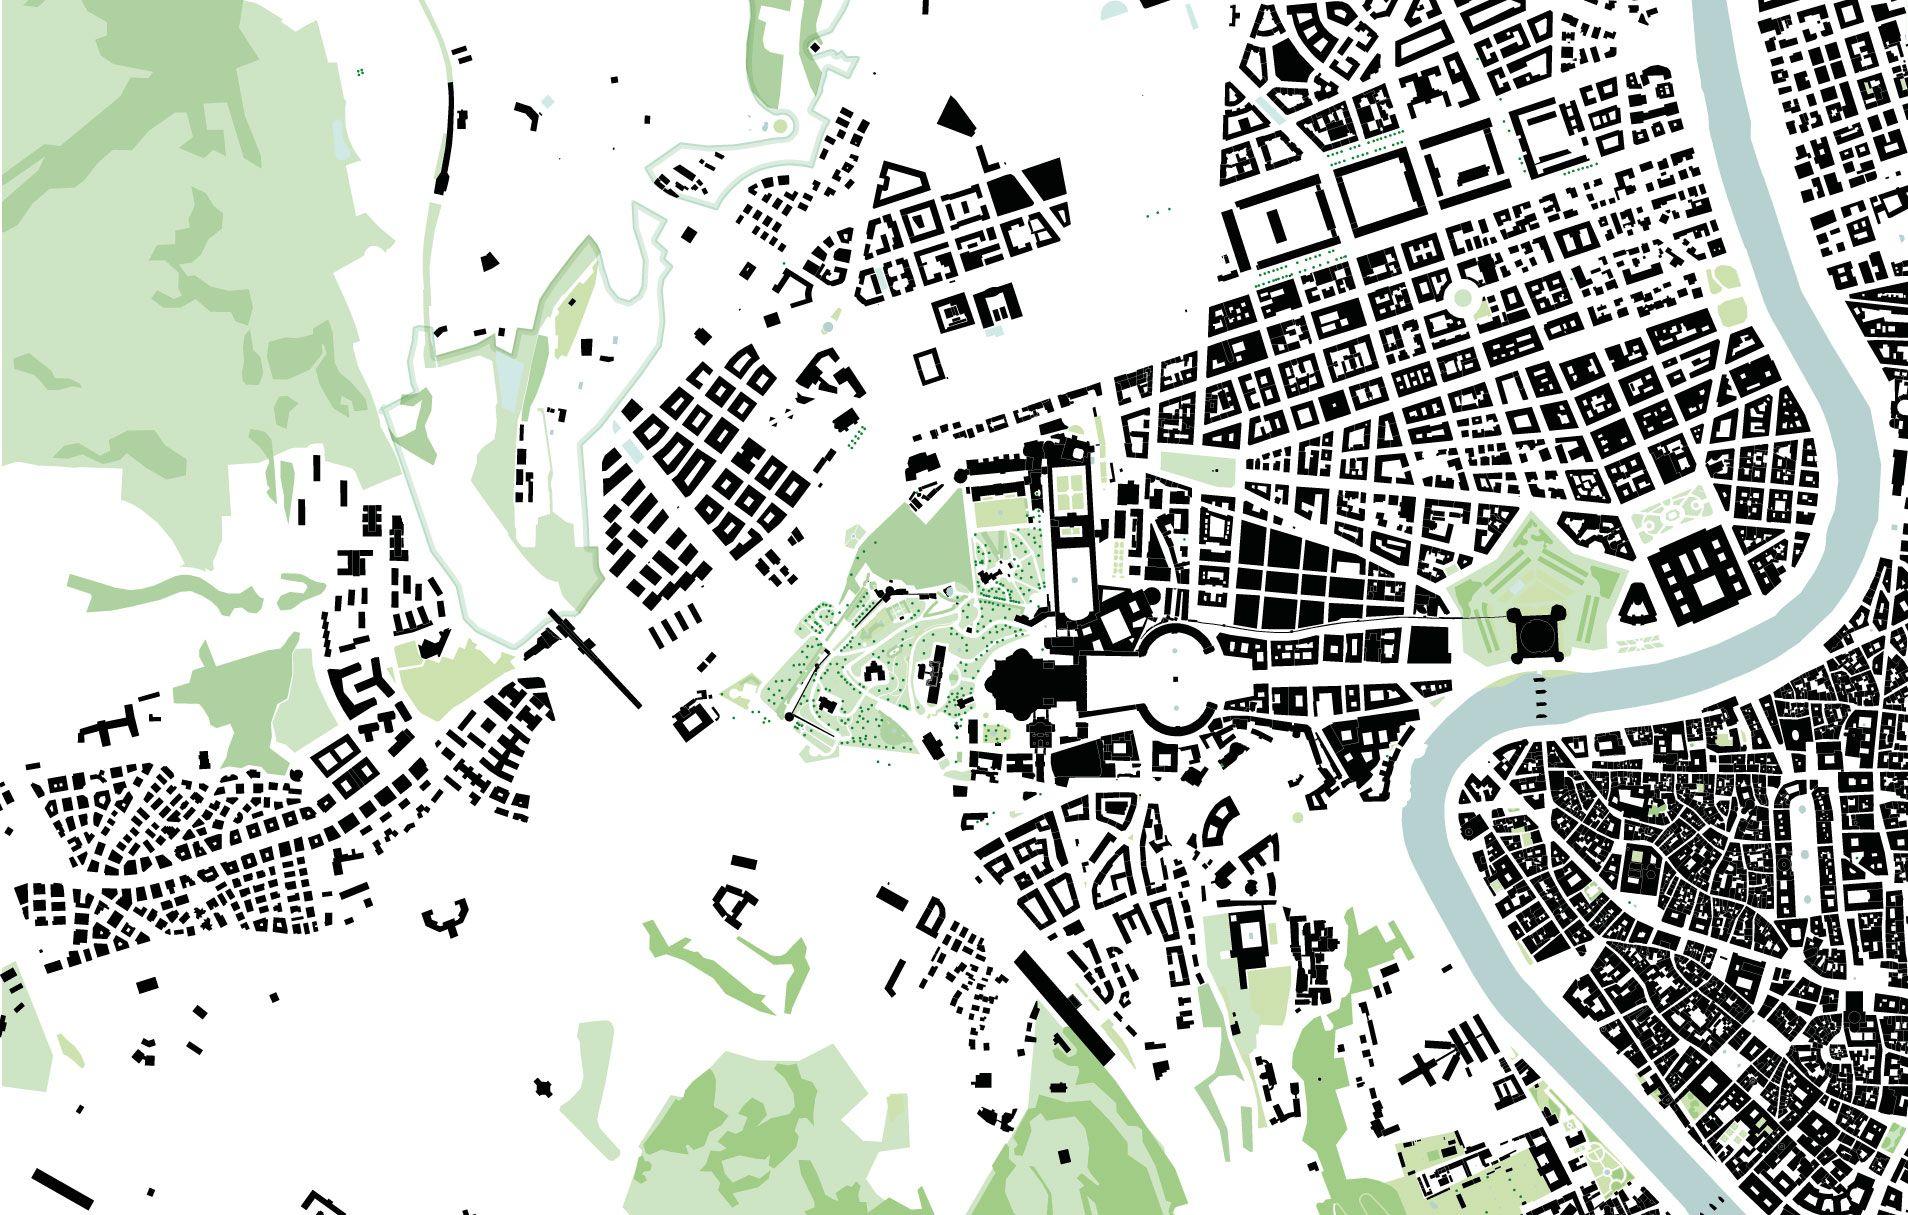 Vatican City green map 110000 architecture presentationmodel